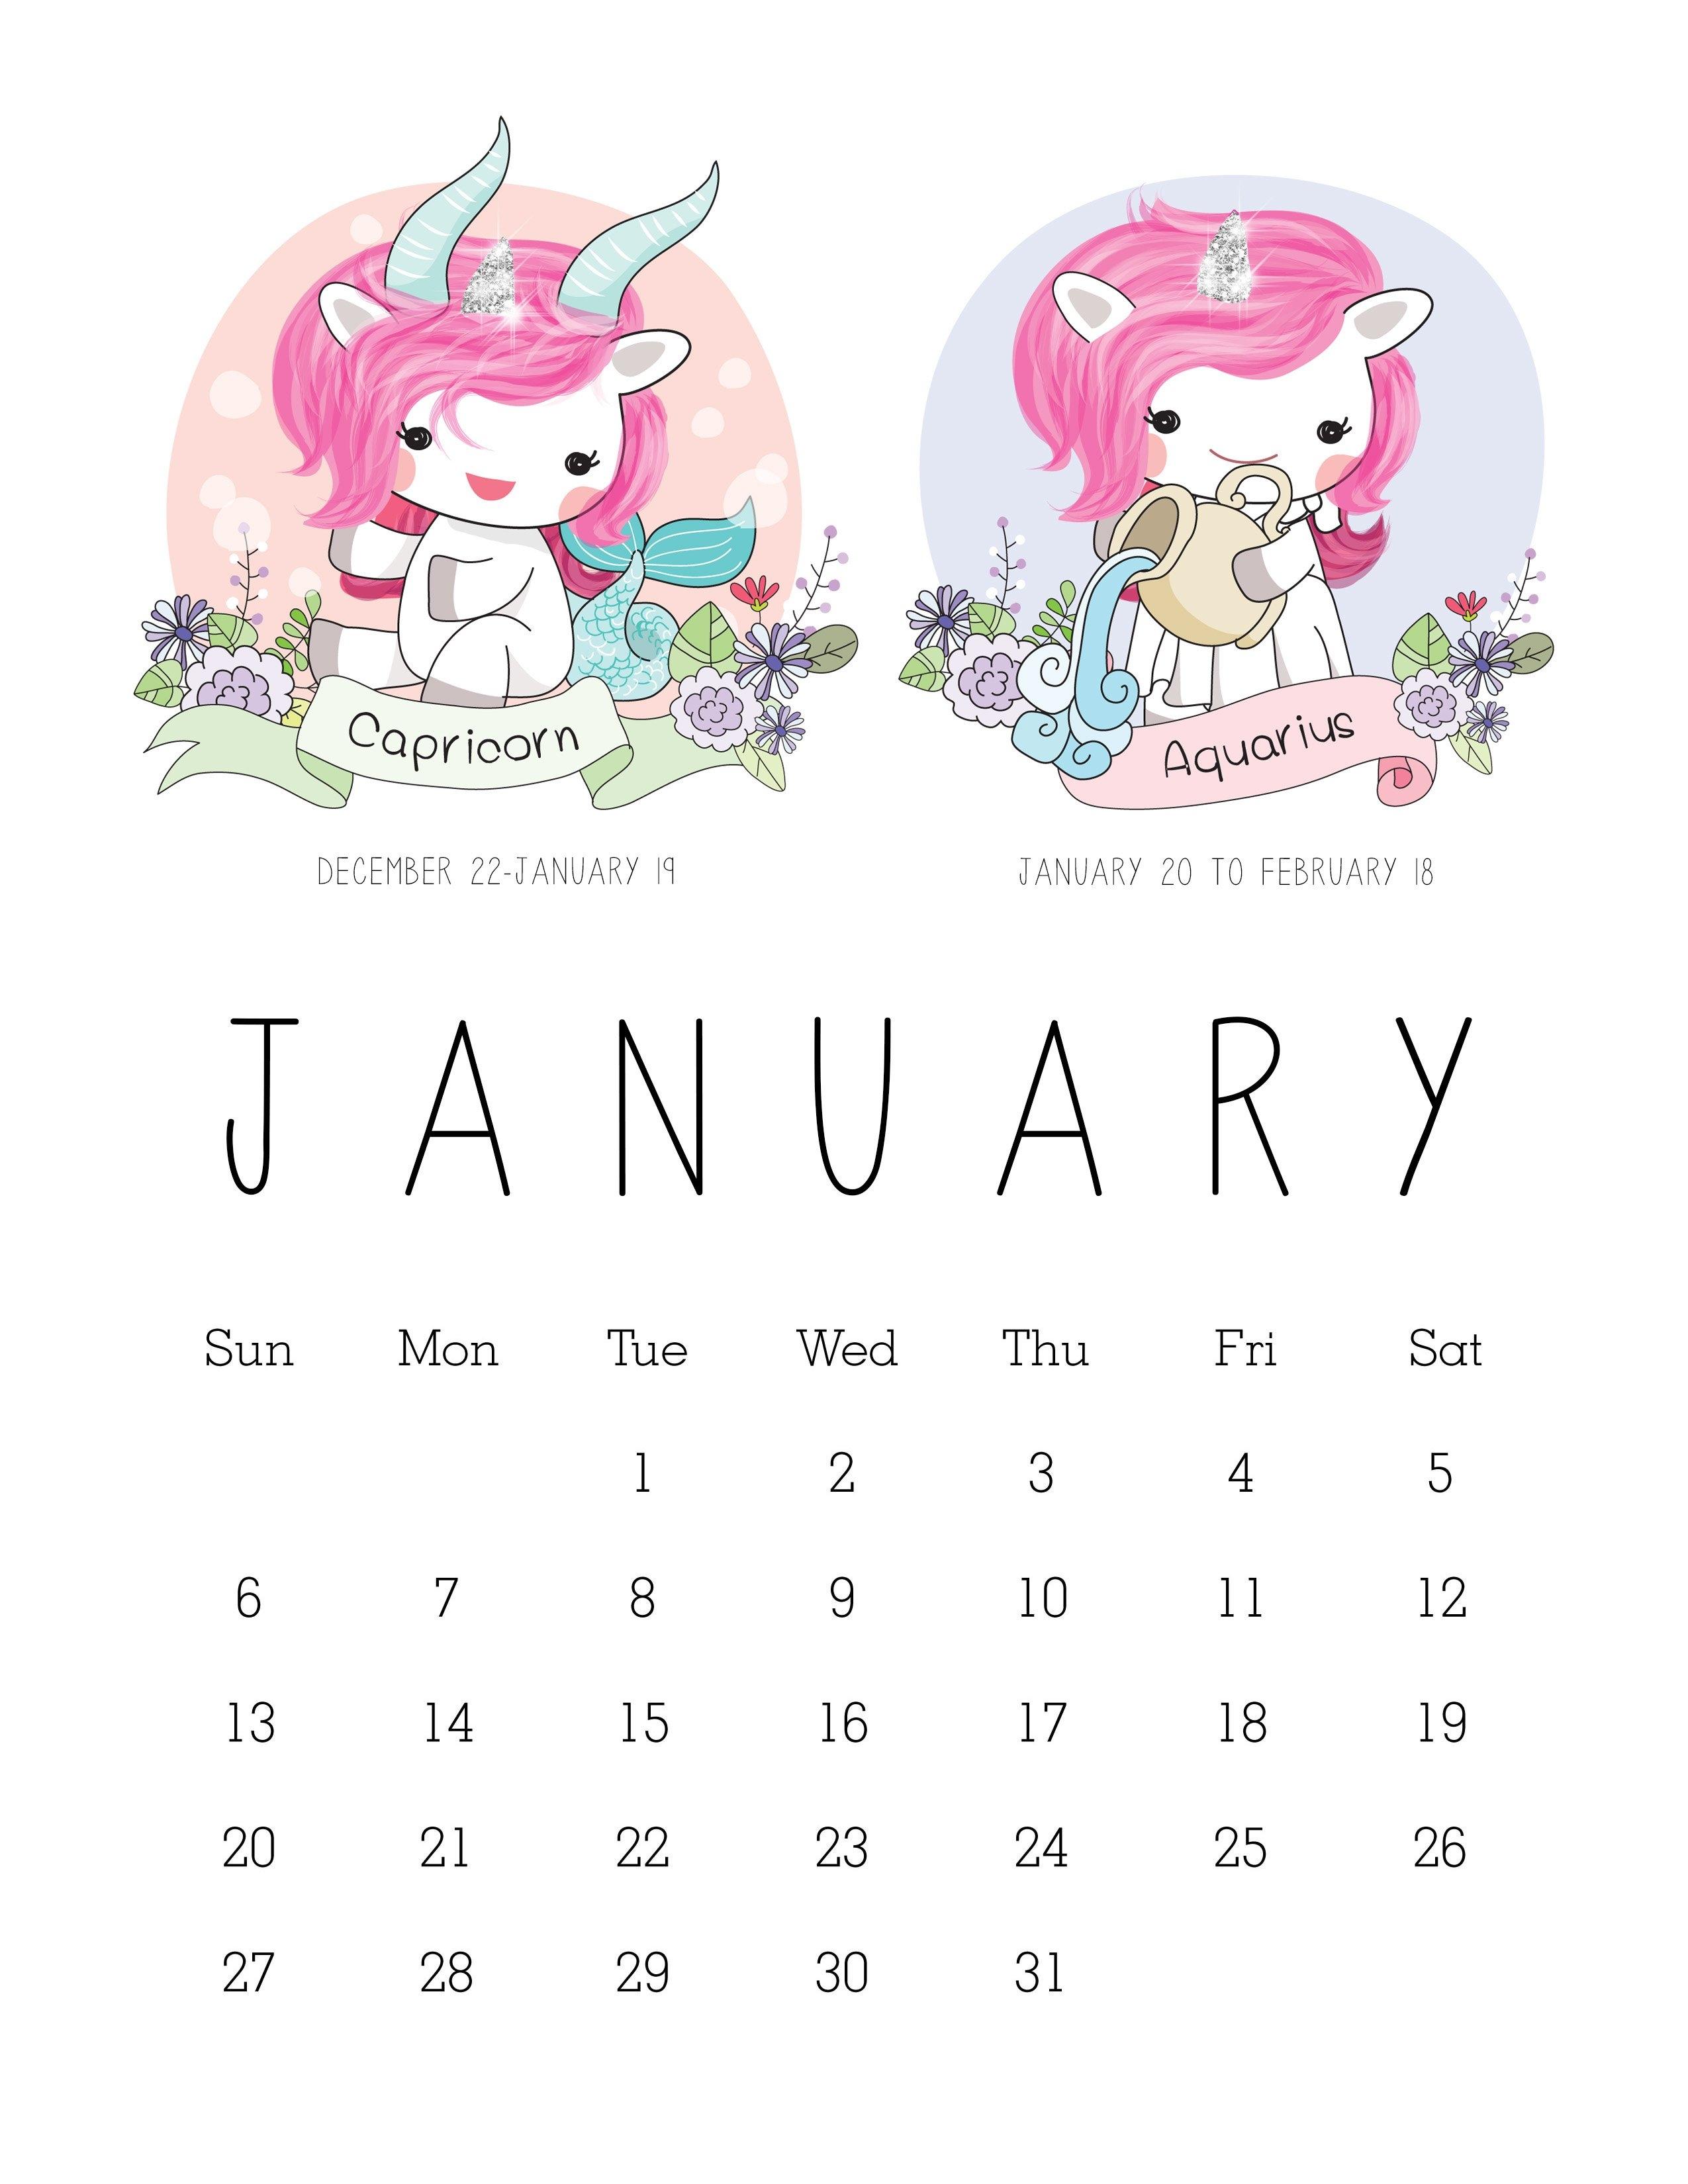 Free Printable 2019 Zodiac Sign Kawaii Unicorn Calendar - The 2019 Zodiac Calendar